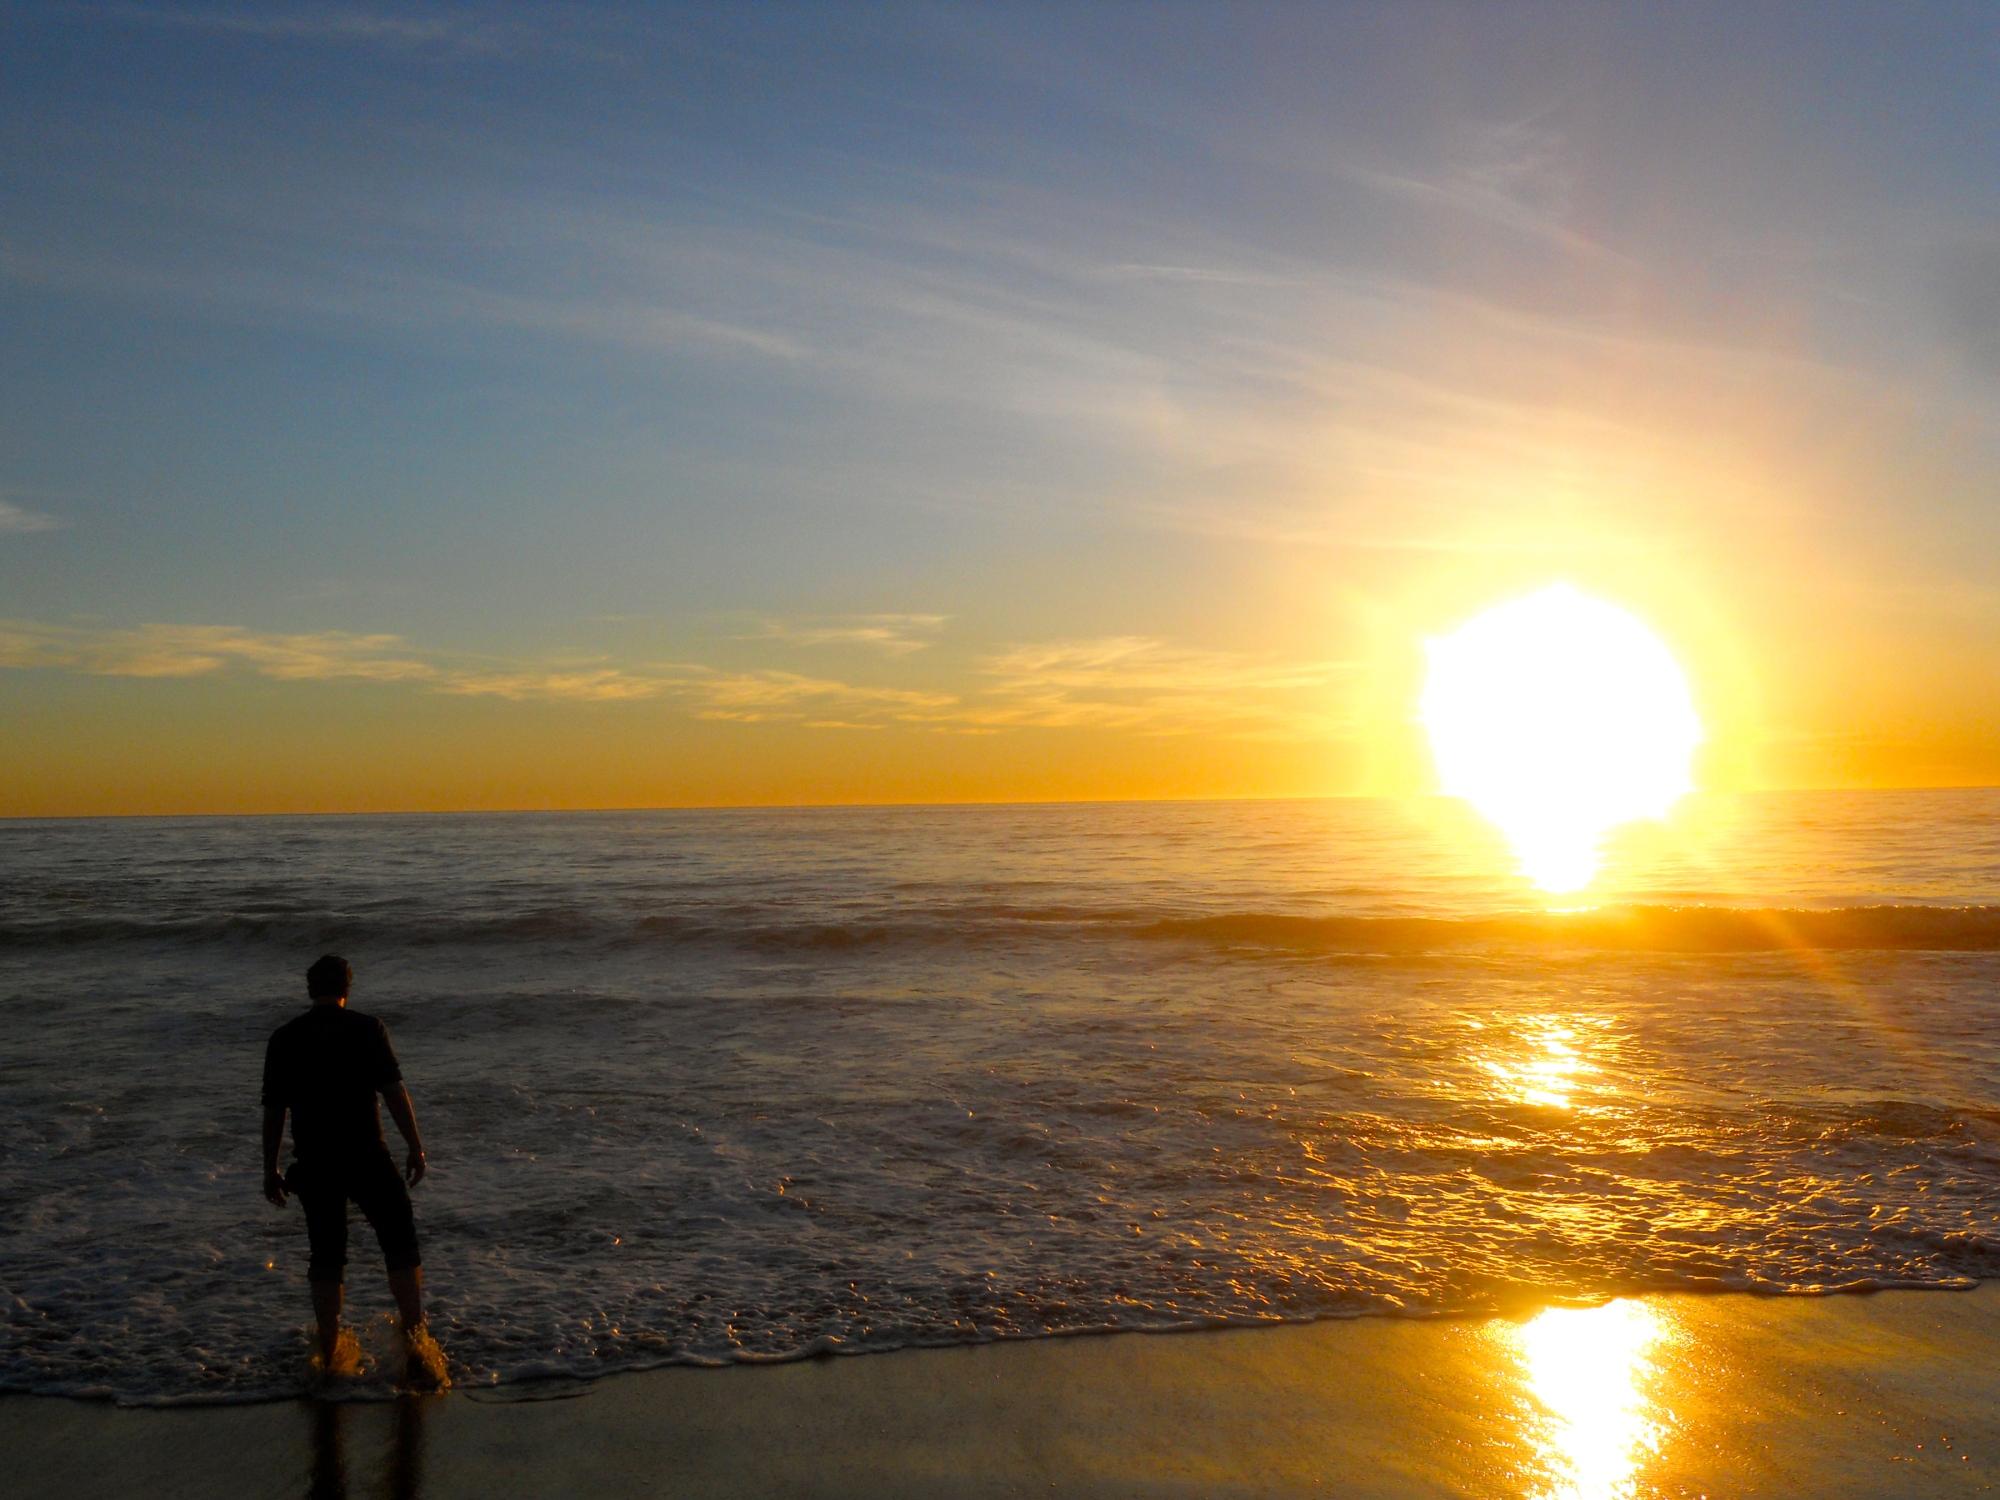 Ryland at Sunset